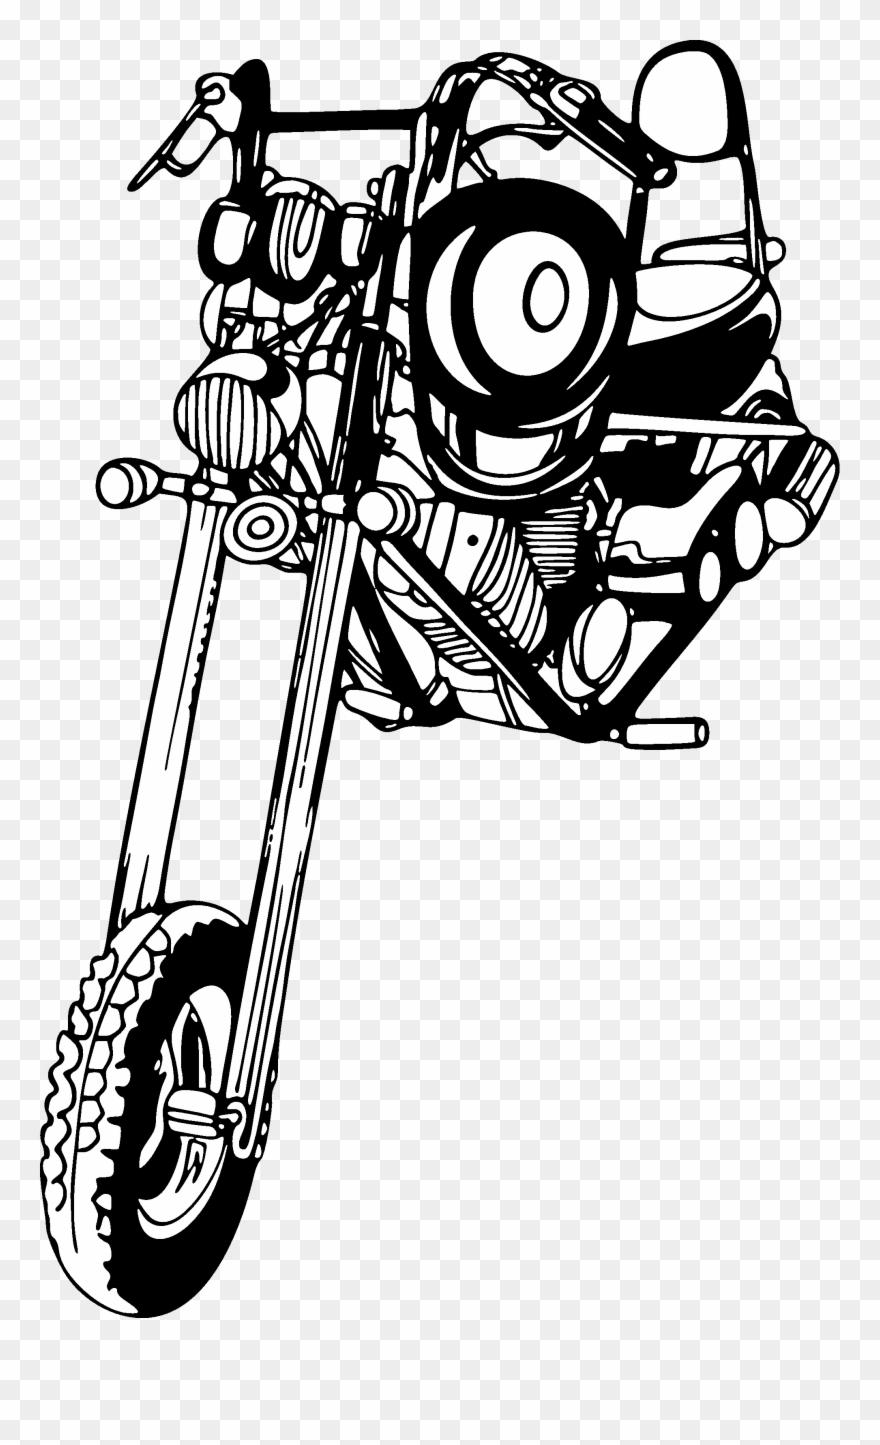 Easy rider clipart vector free Chopper Easy Rider - Sticker Clipart (#1597708) - PinClipart vector free